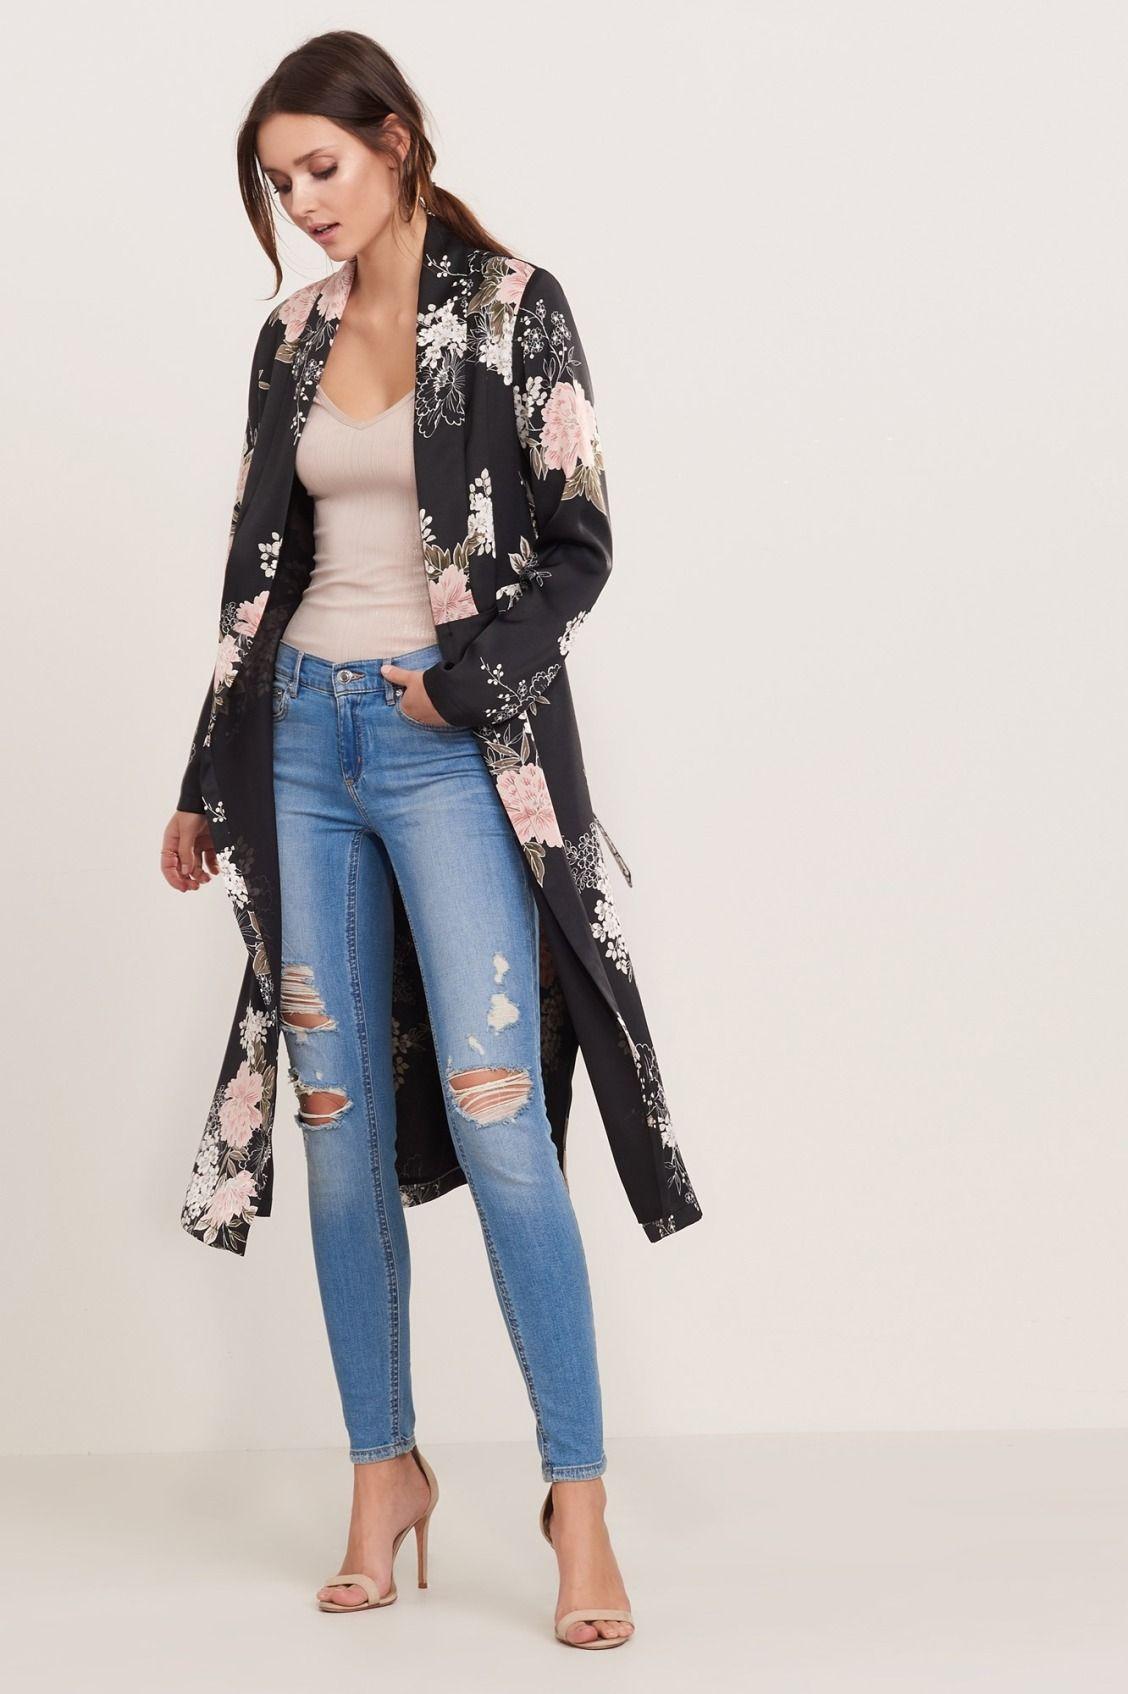 Slip into style Floral Maxi Kimono with Slits | Spring 2017 ...